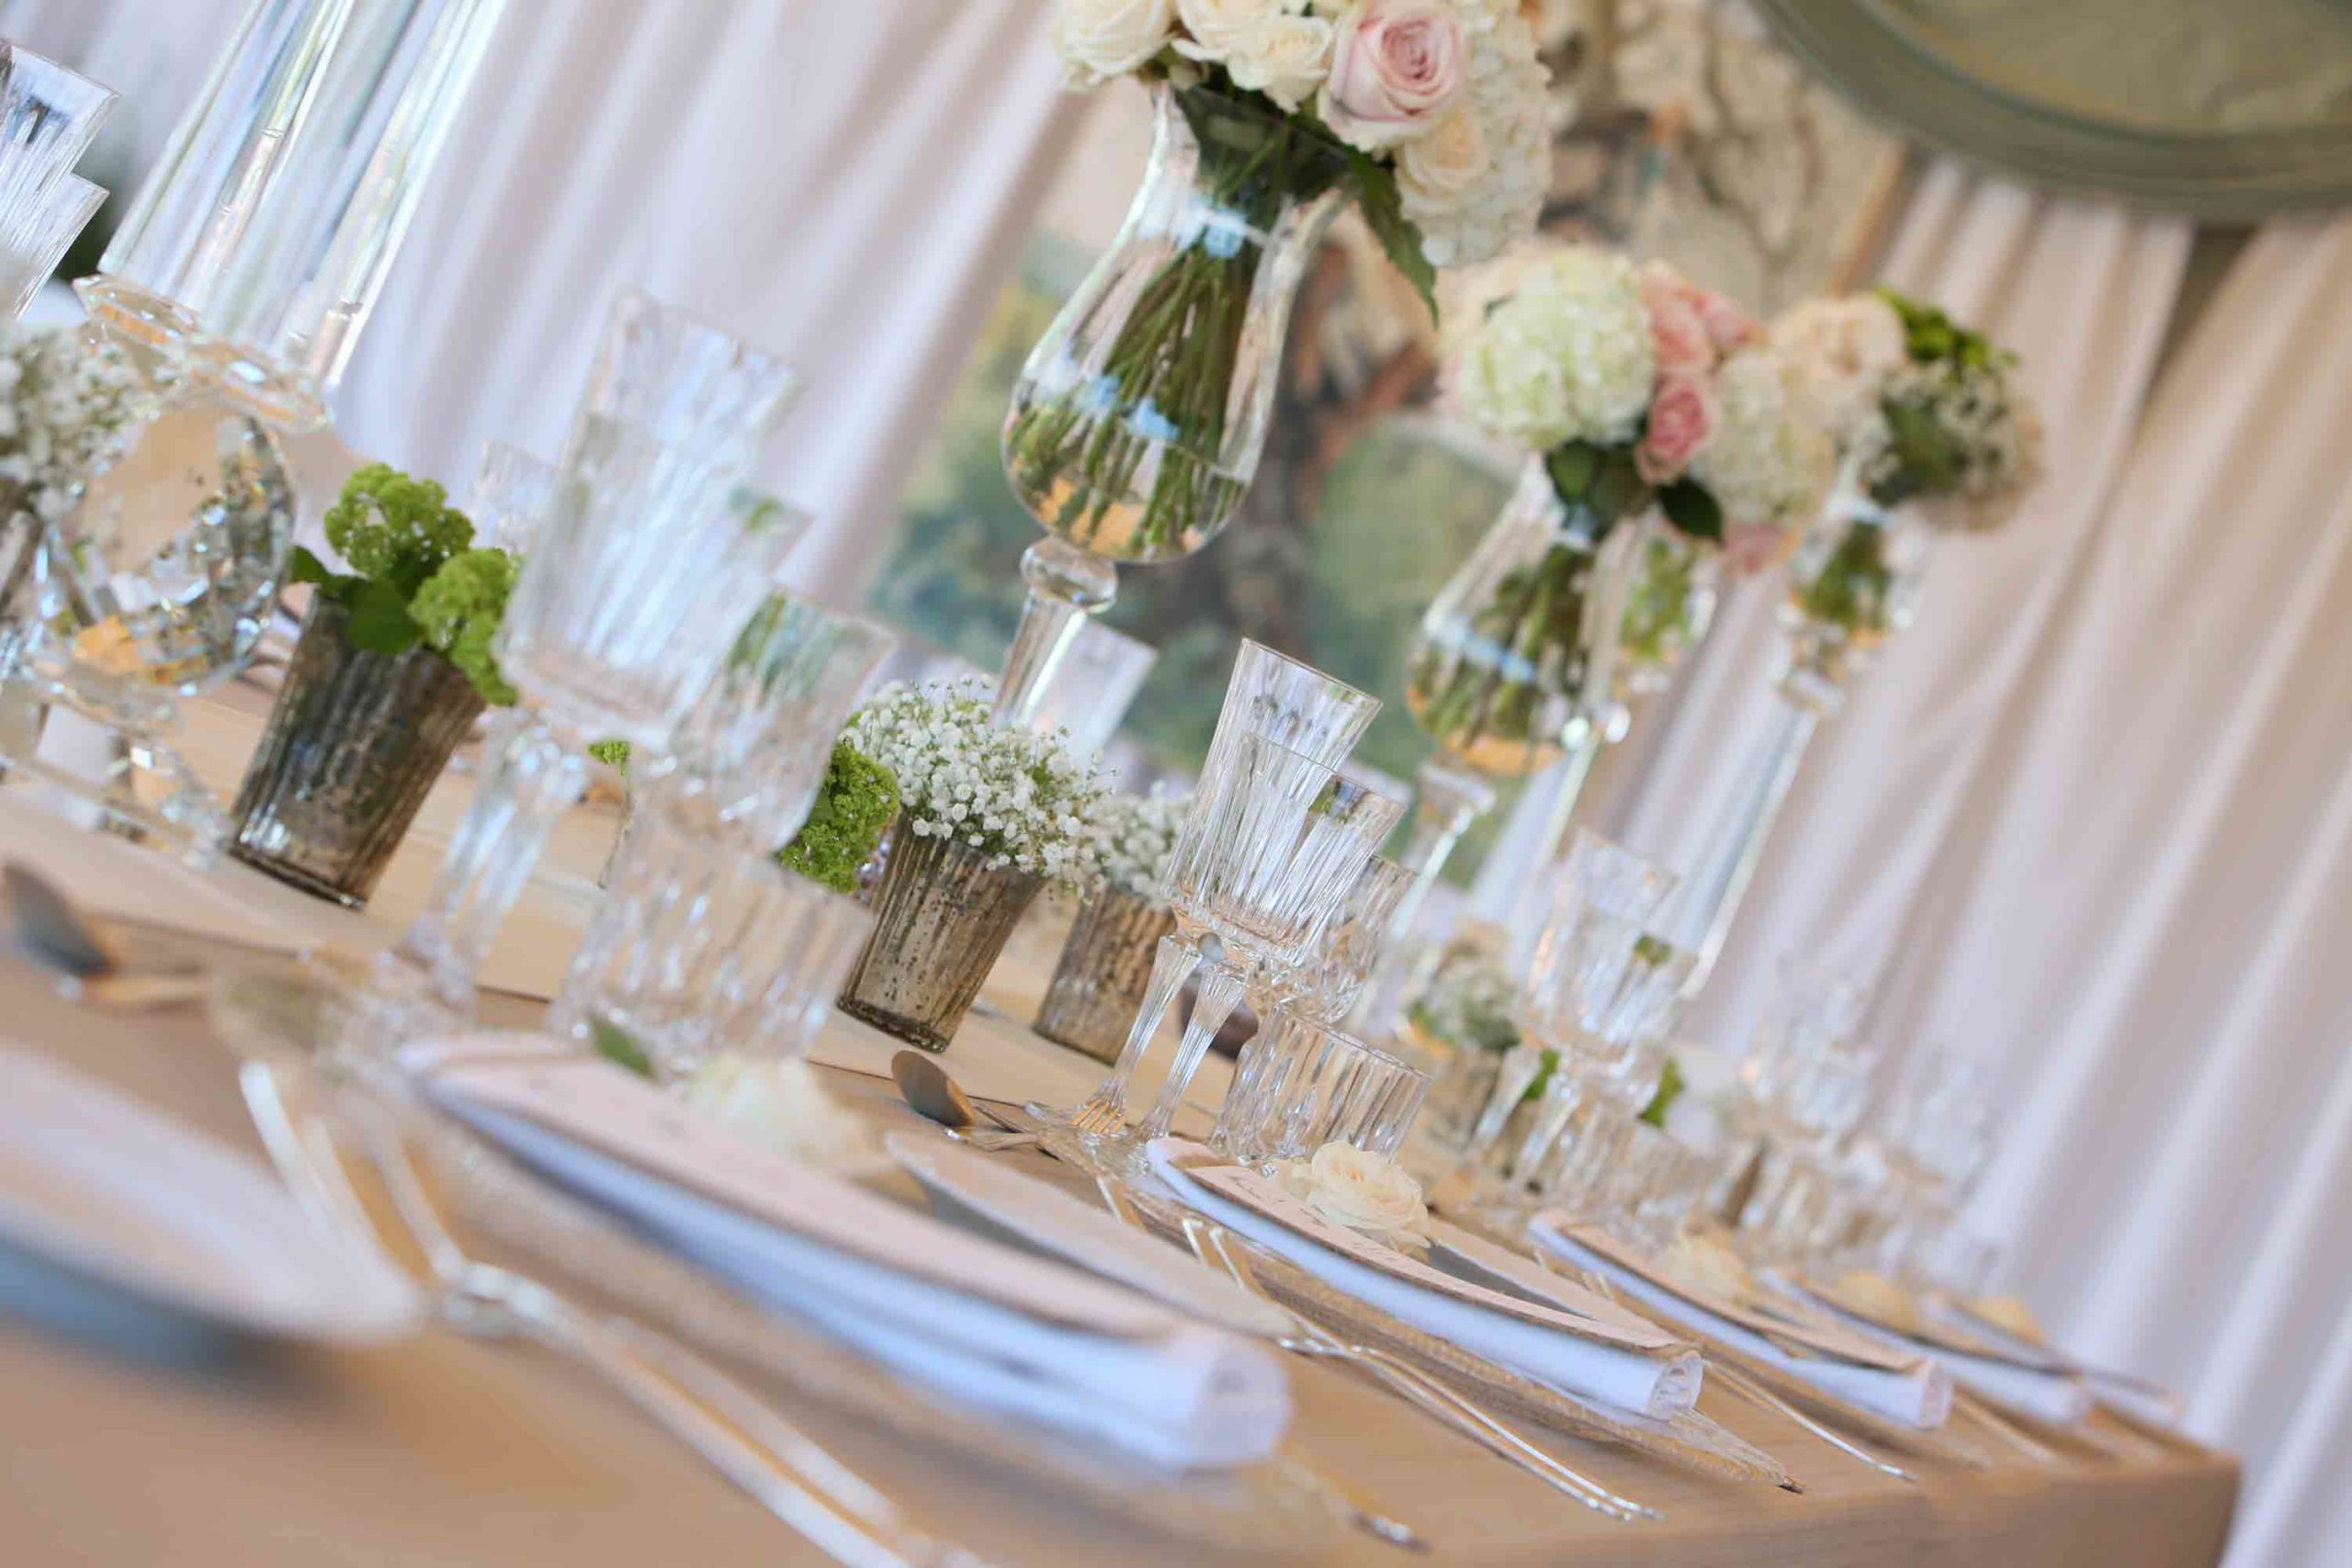 interno-gazebo-allestimento-wedding-ristorante